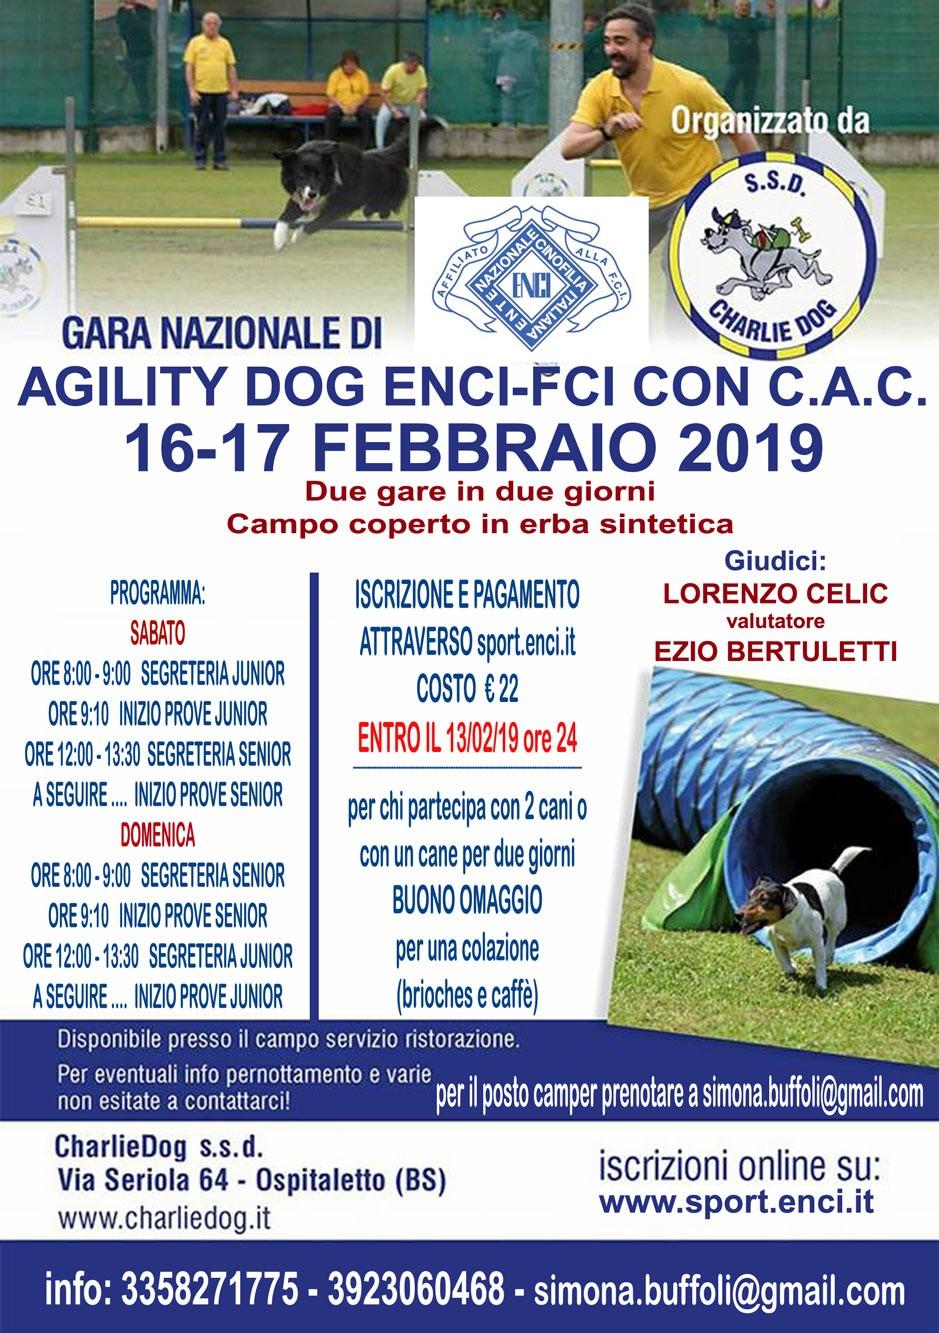 GARA NAZIONALE DI AGILITY CHARLIE DOG  17 FEBBRAIO 2019